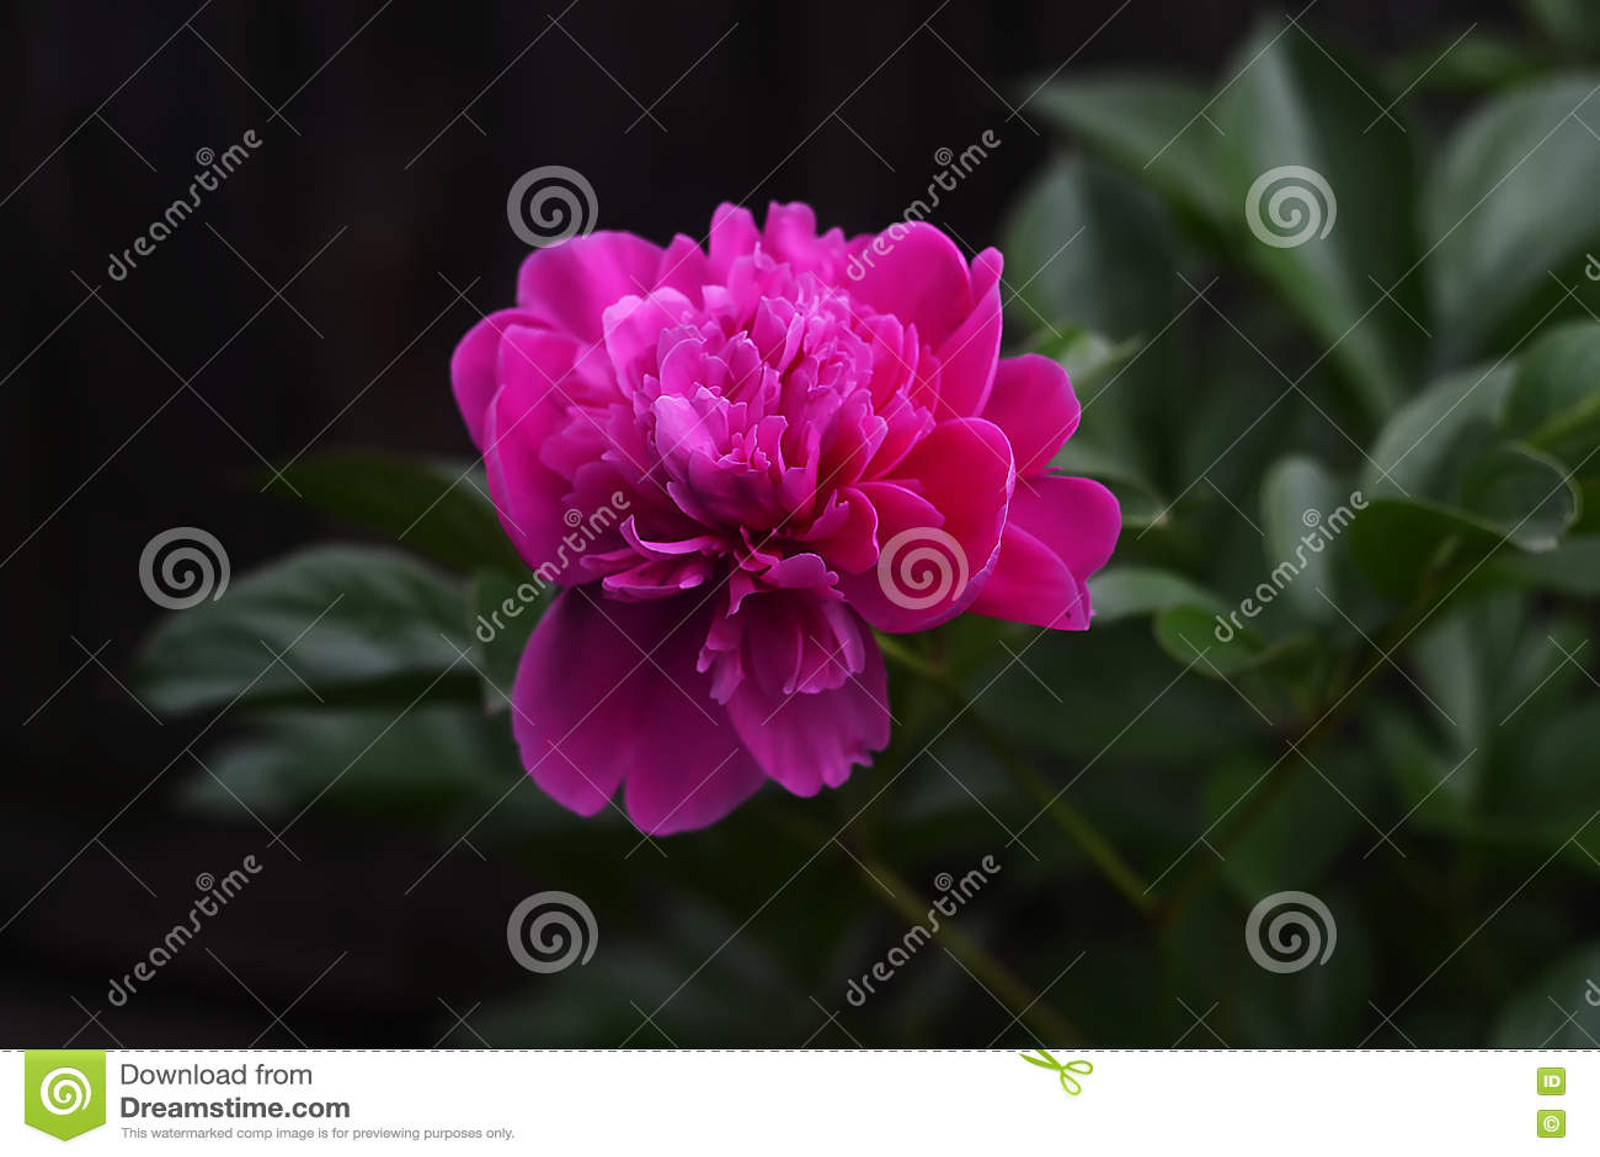 A close up macro shot of a red rose stock image image of garden a close up macro shot of a red rose izmirmasajfo